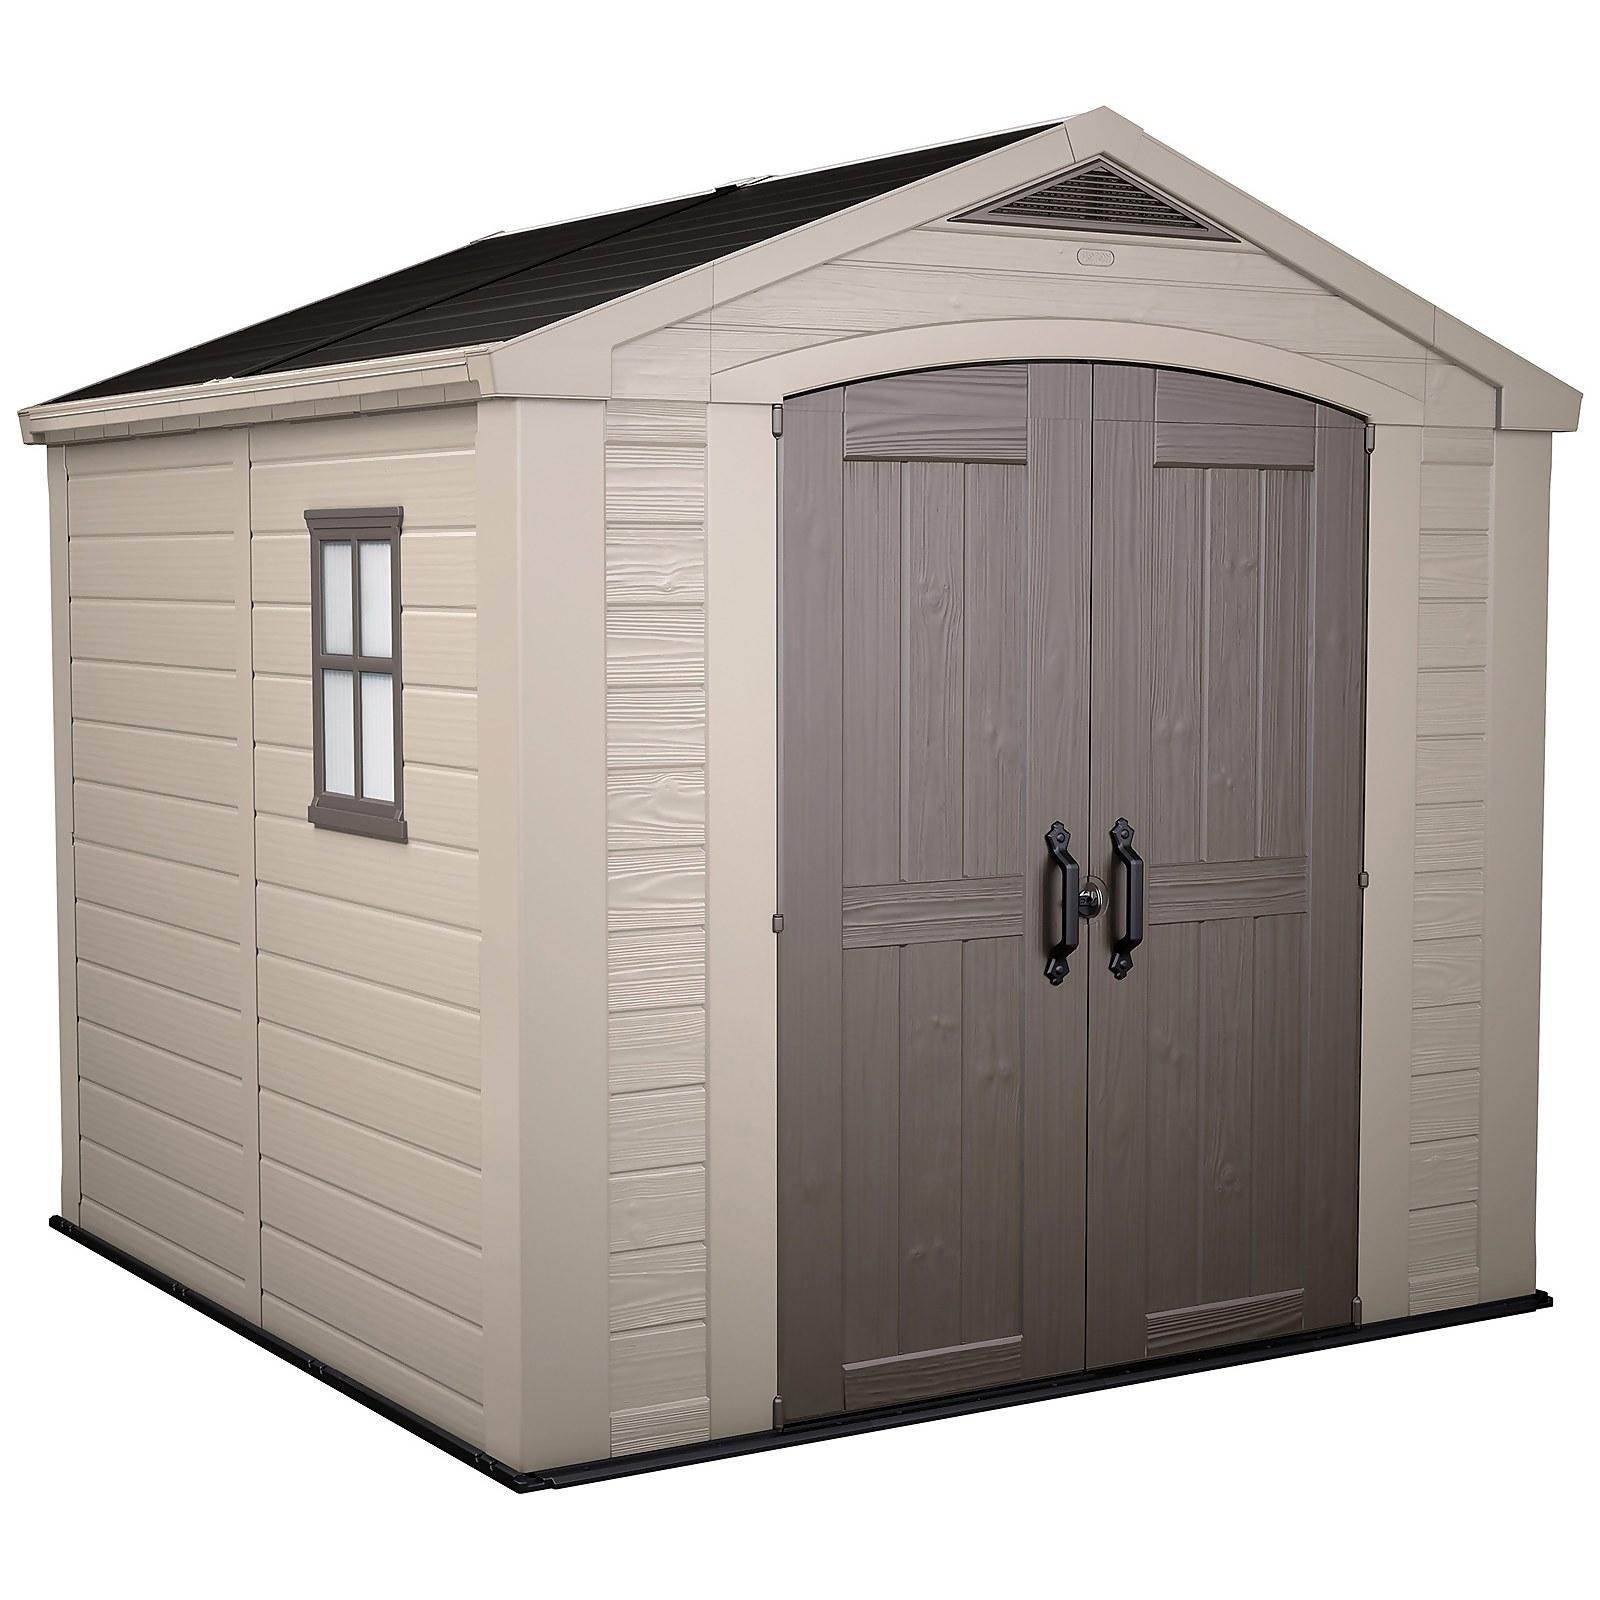 Keter Factor 8 x 8ft Outdoor Garden Apex Storage Shed - Beige/Brown